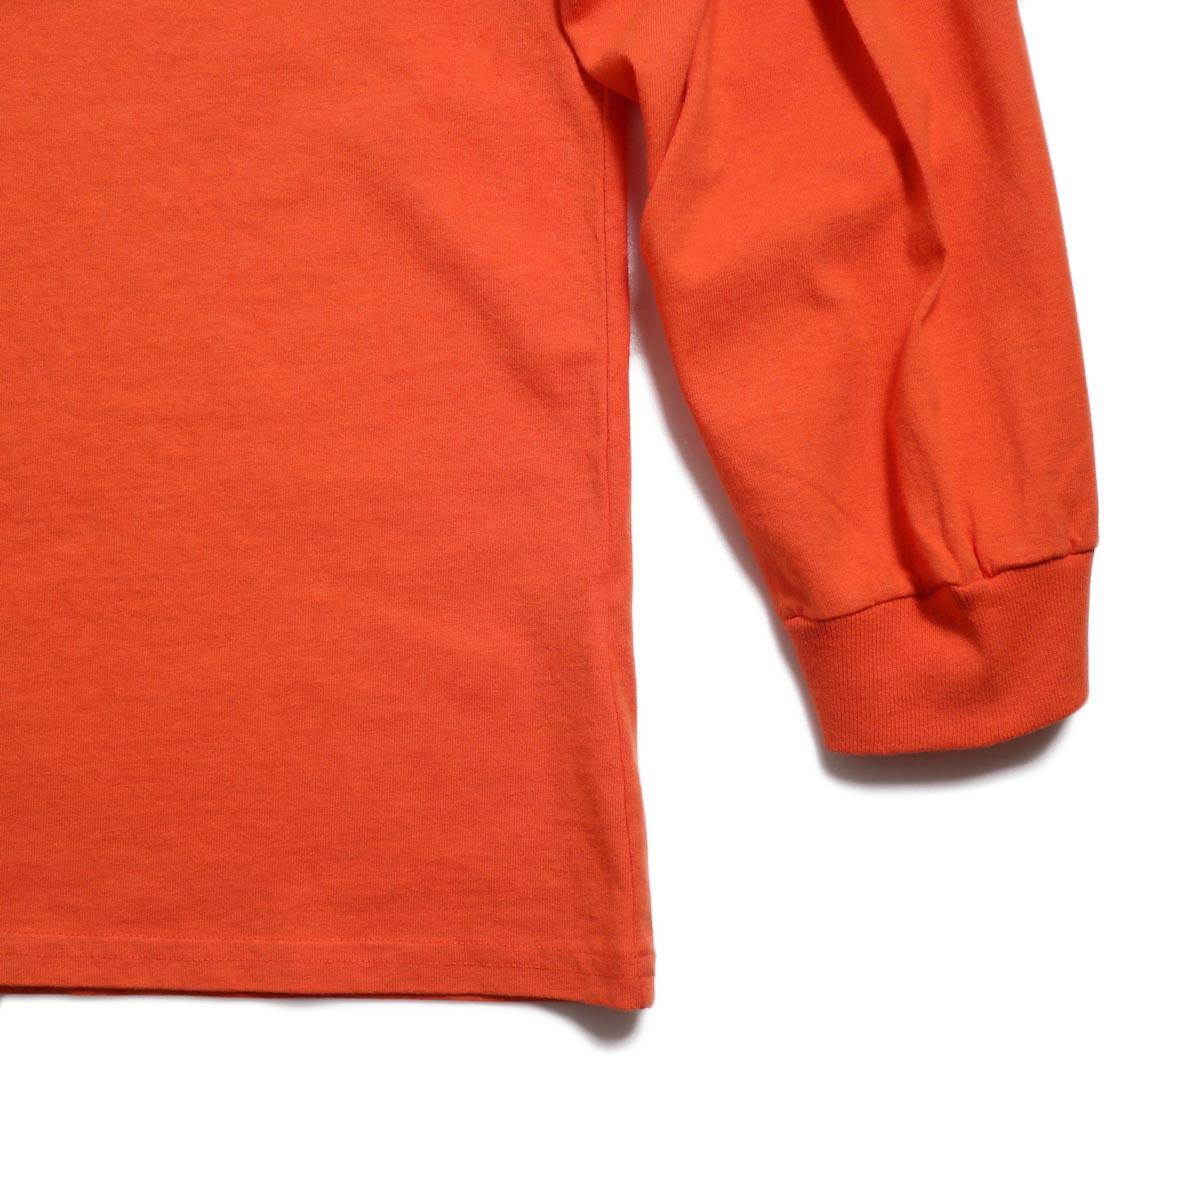 UNIVERSAL PRODUCTS / Heavy Weight L/S T-Shirt -Orange 裾、袖